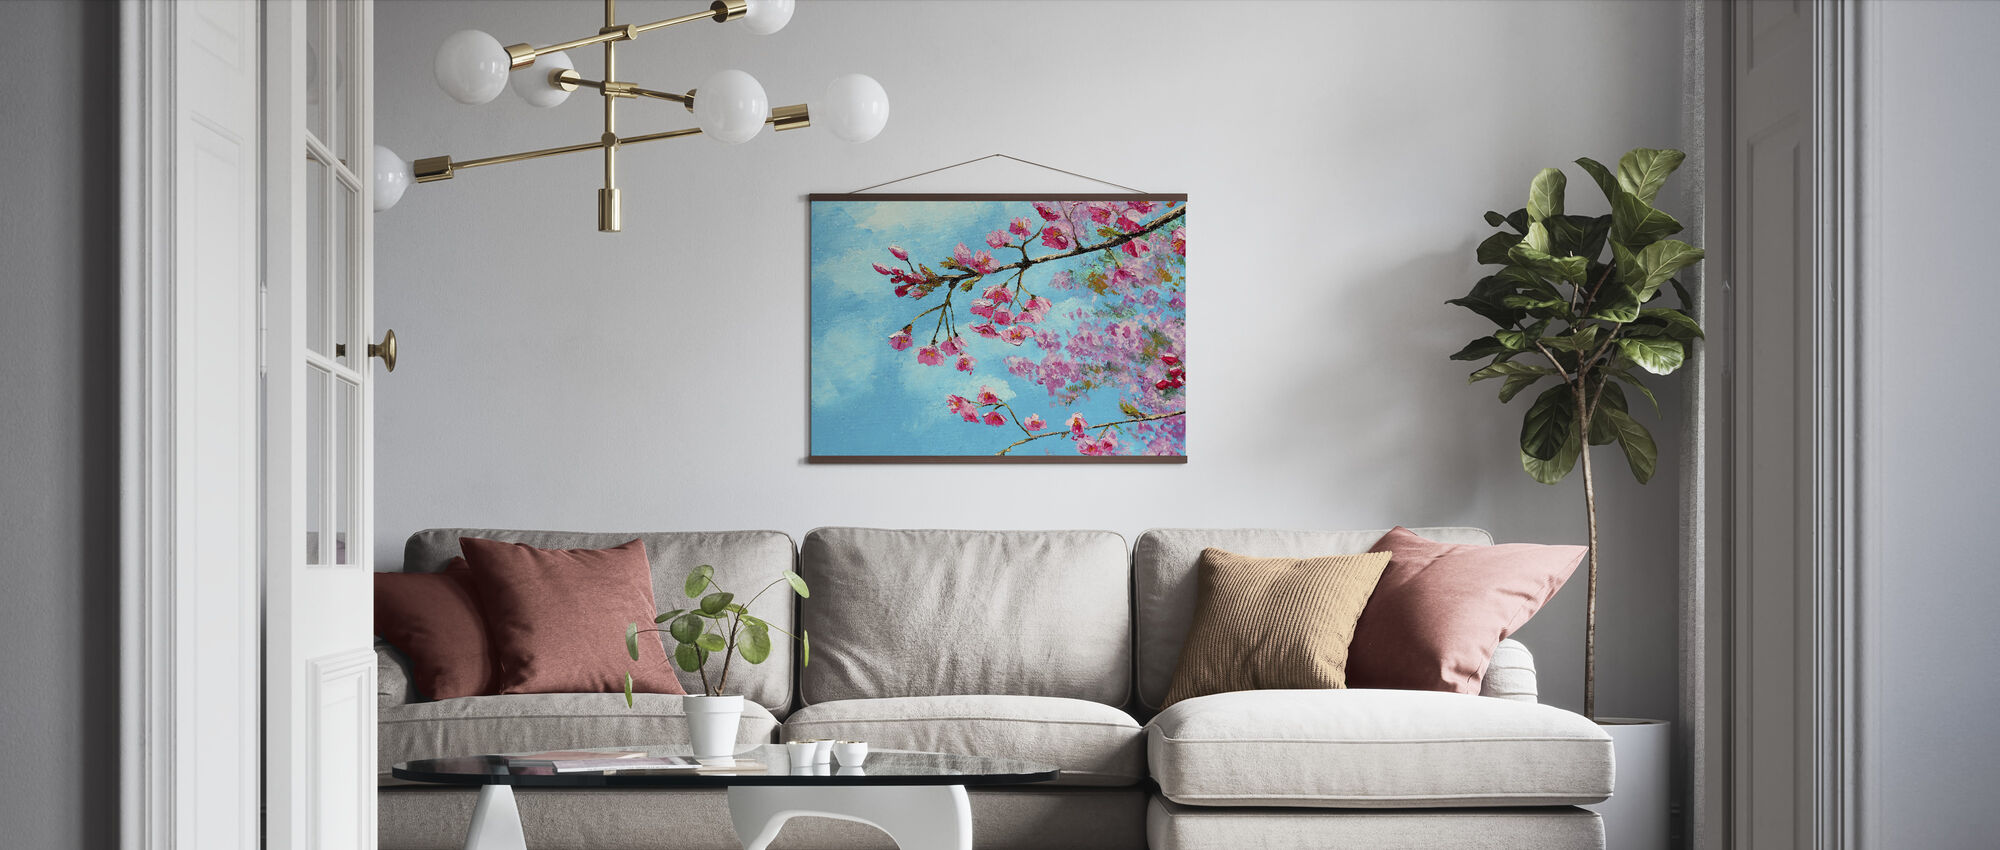 Cherry Blossom Blue - Poster - Living Room